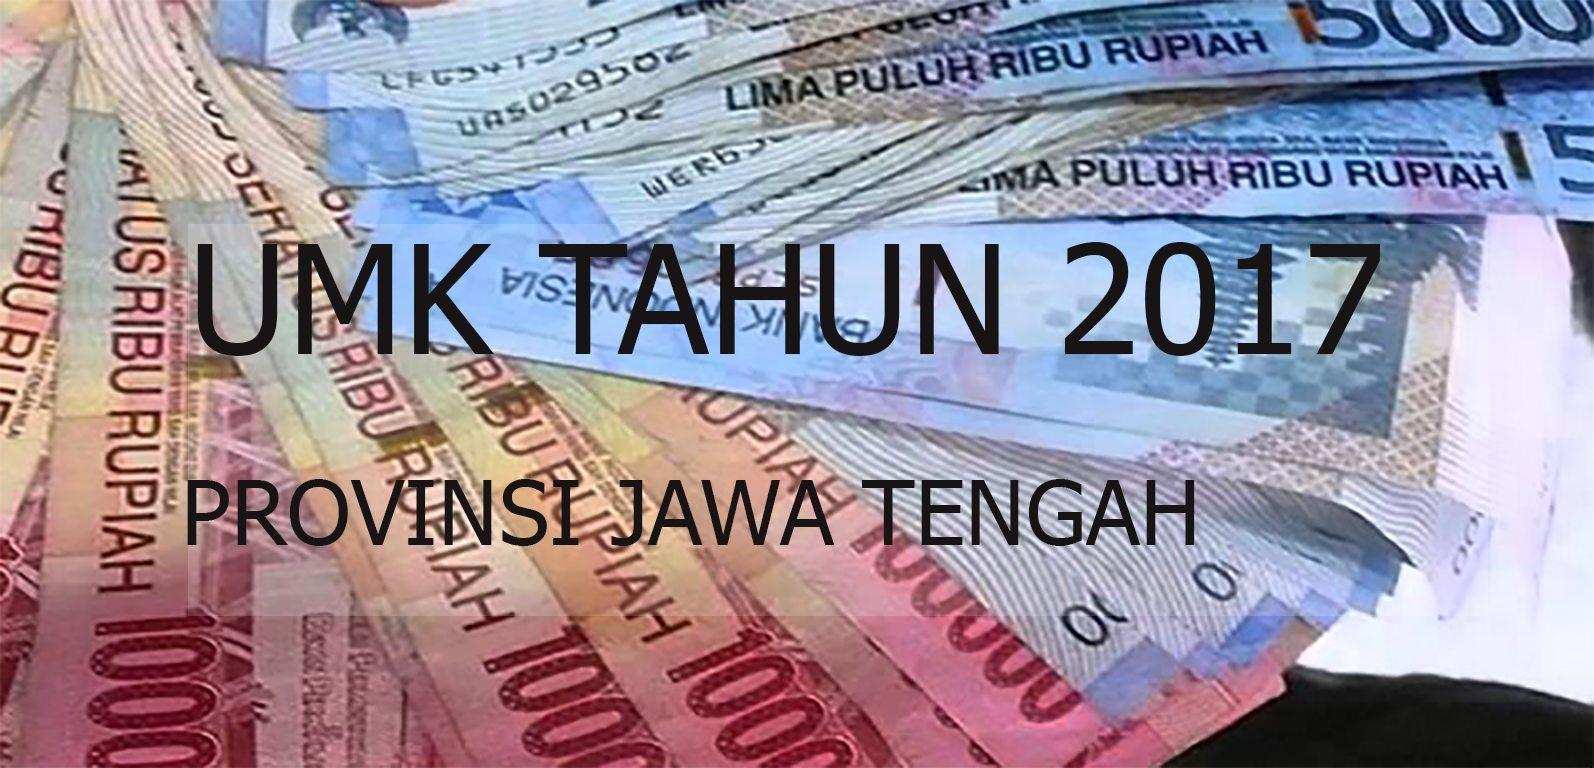 UMK PROVINSI JAWA TENGAH TAHUN 2017